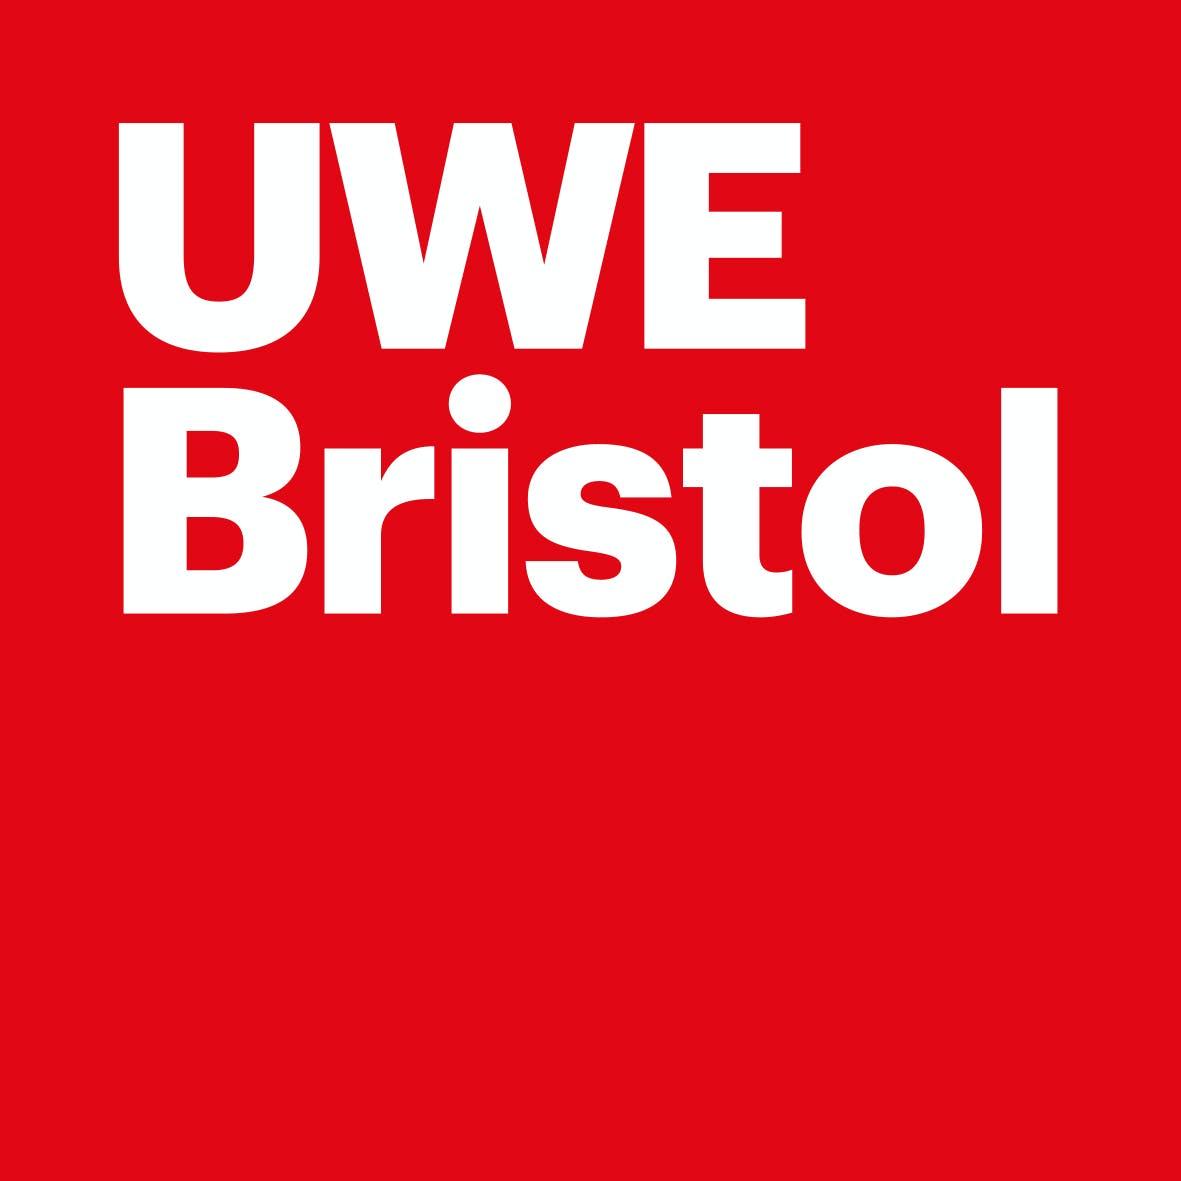 University of the West of England (UWE Bristol) - Bristol